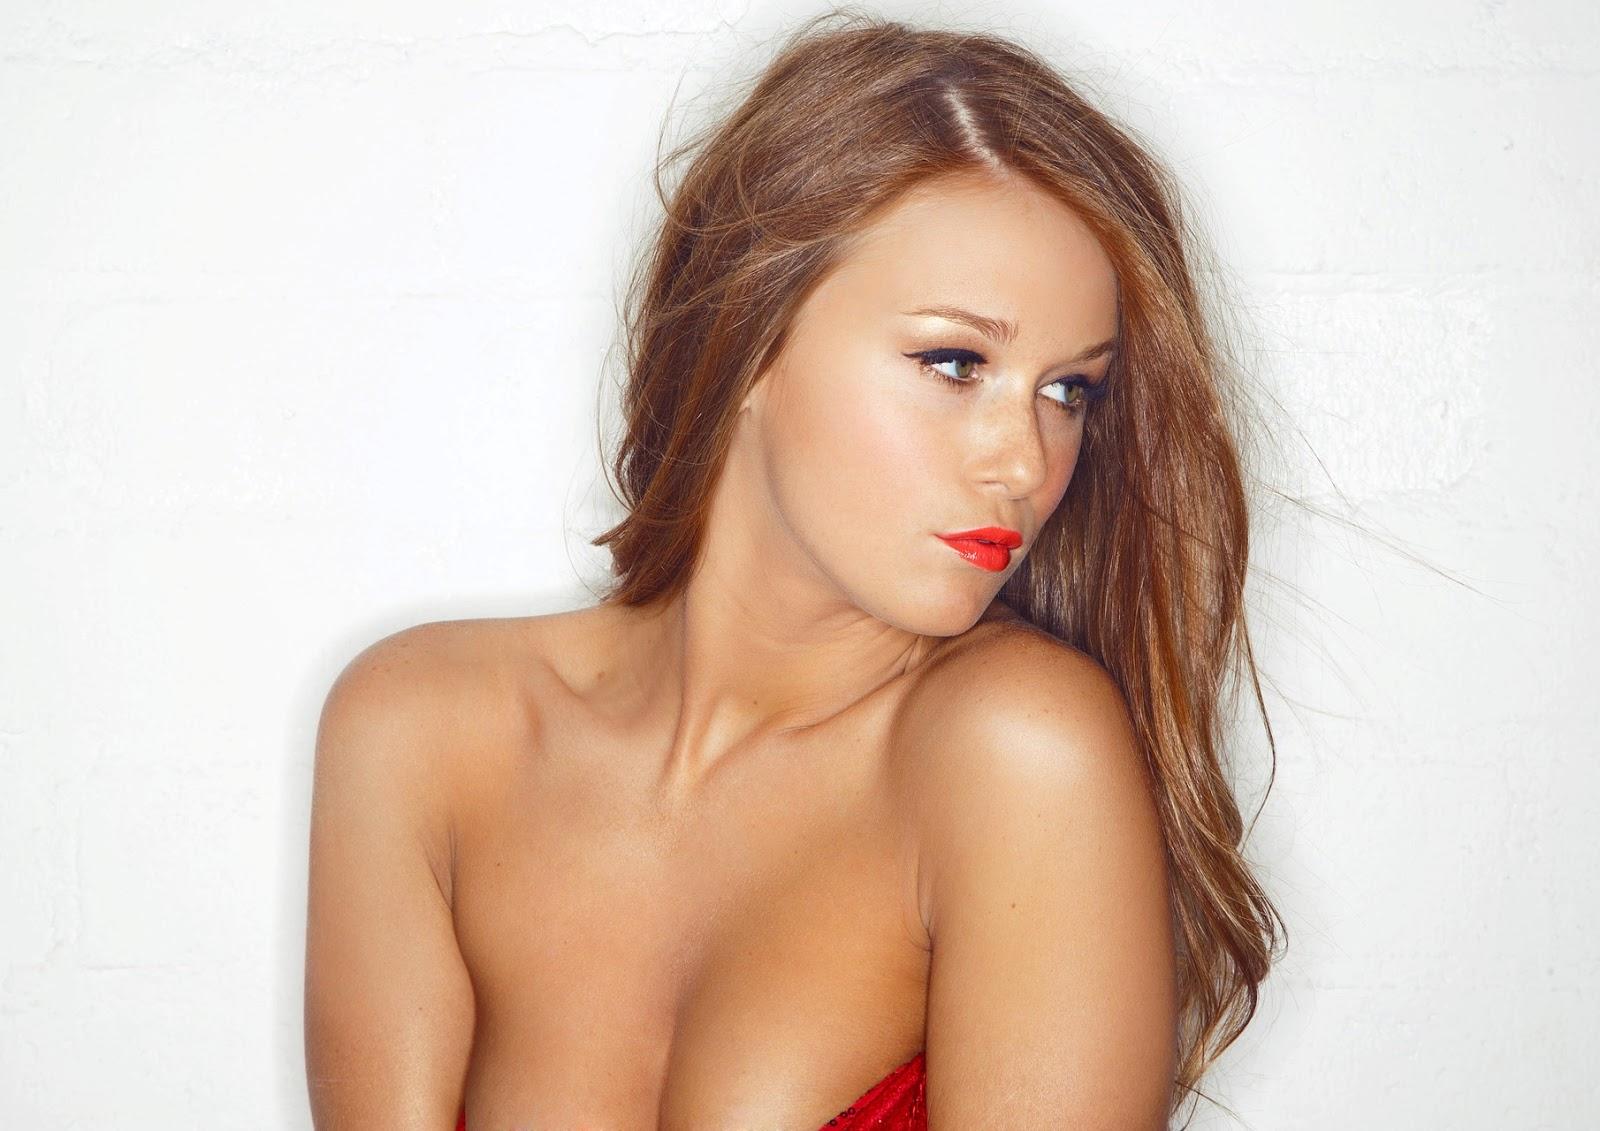 Leanna Decker nudes (39 pictures), foto Porno, iCloud, bra 2020